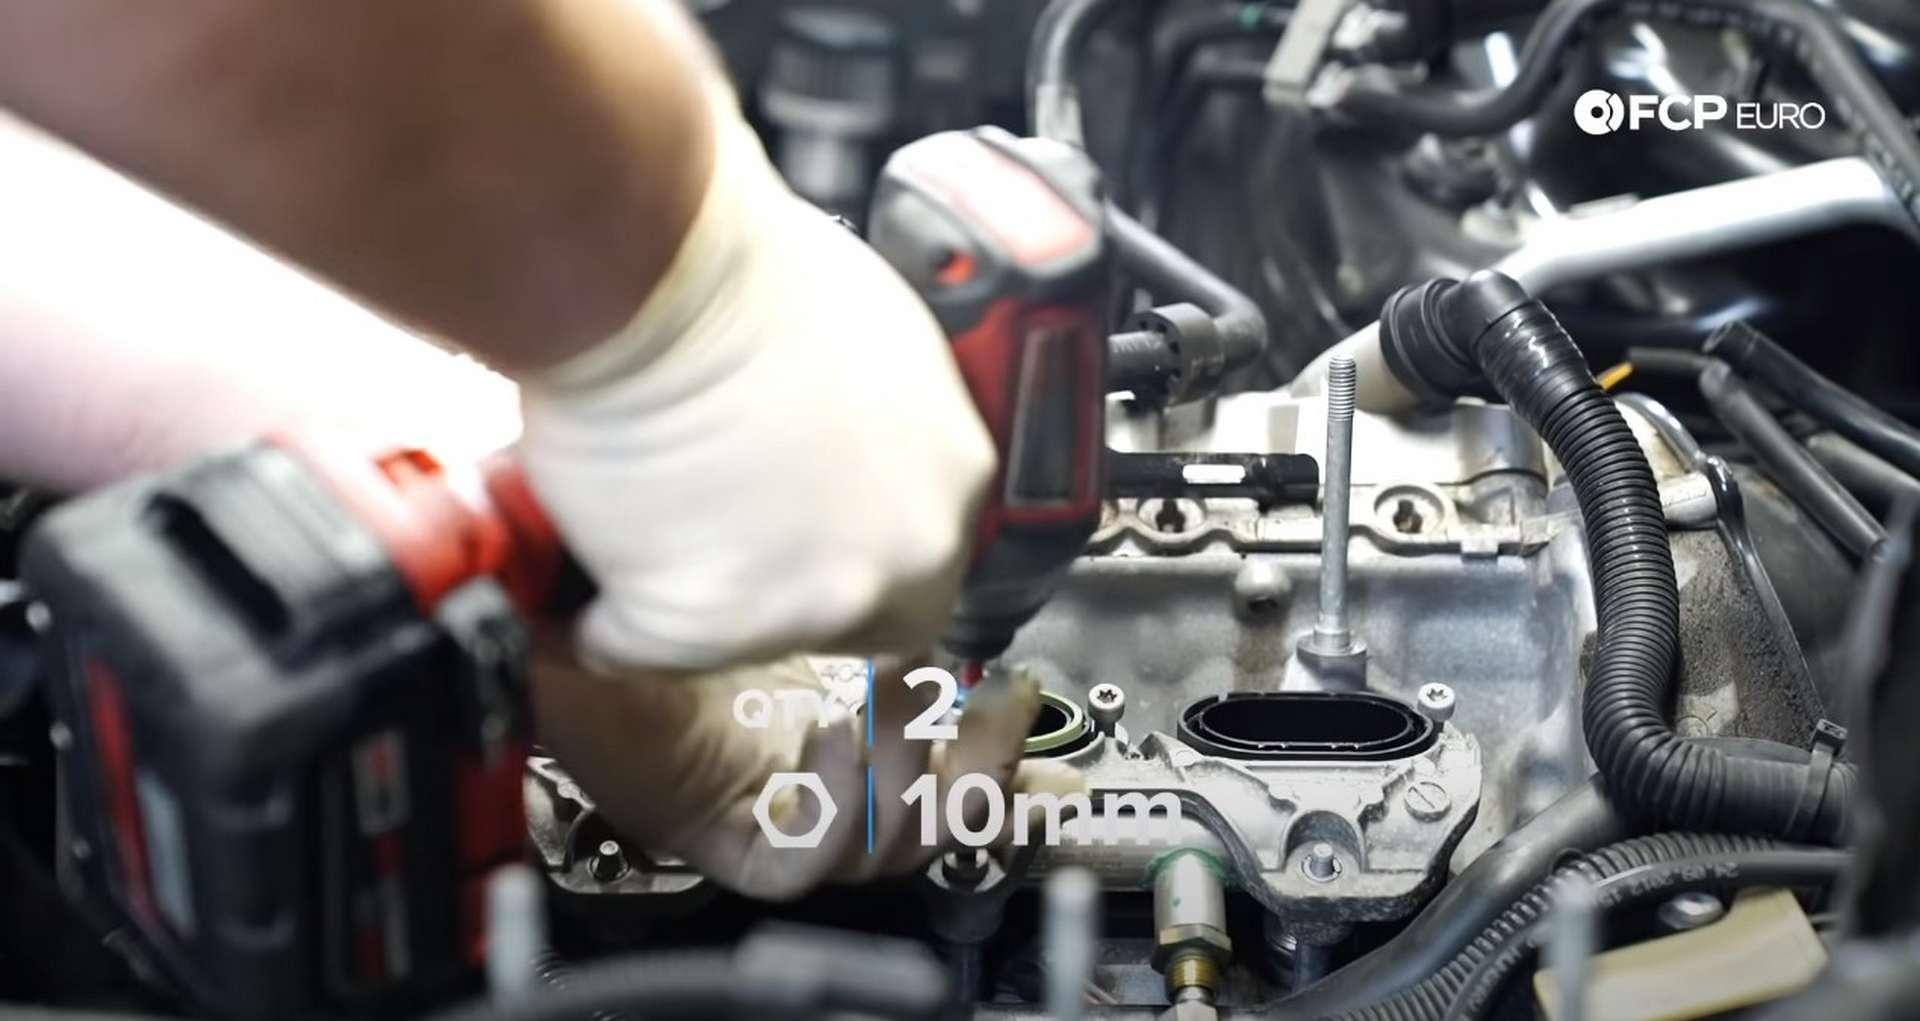 DIY Audi 3.0t Walnut Blasting Intake Valves unbolting the intake manifold